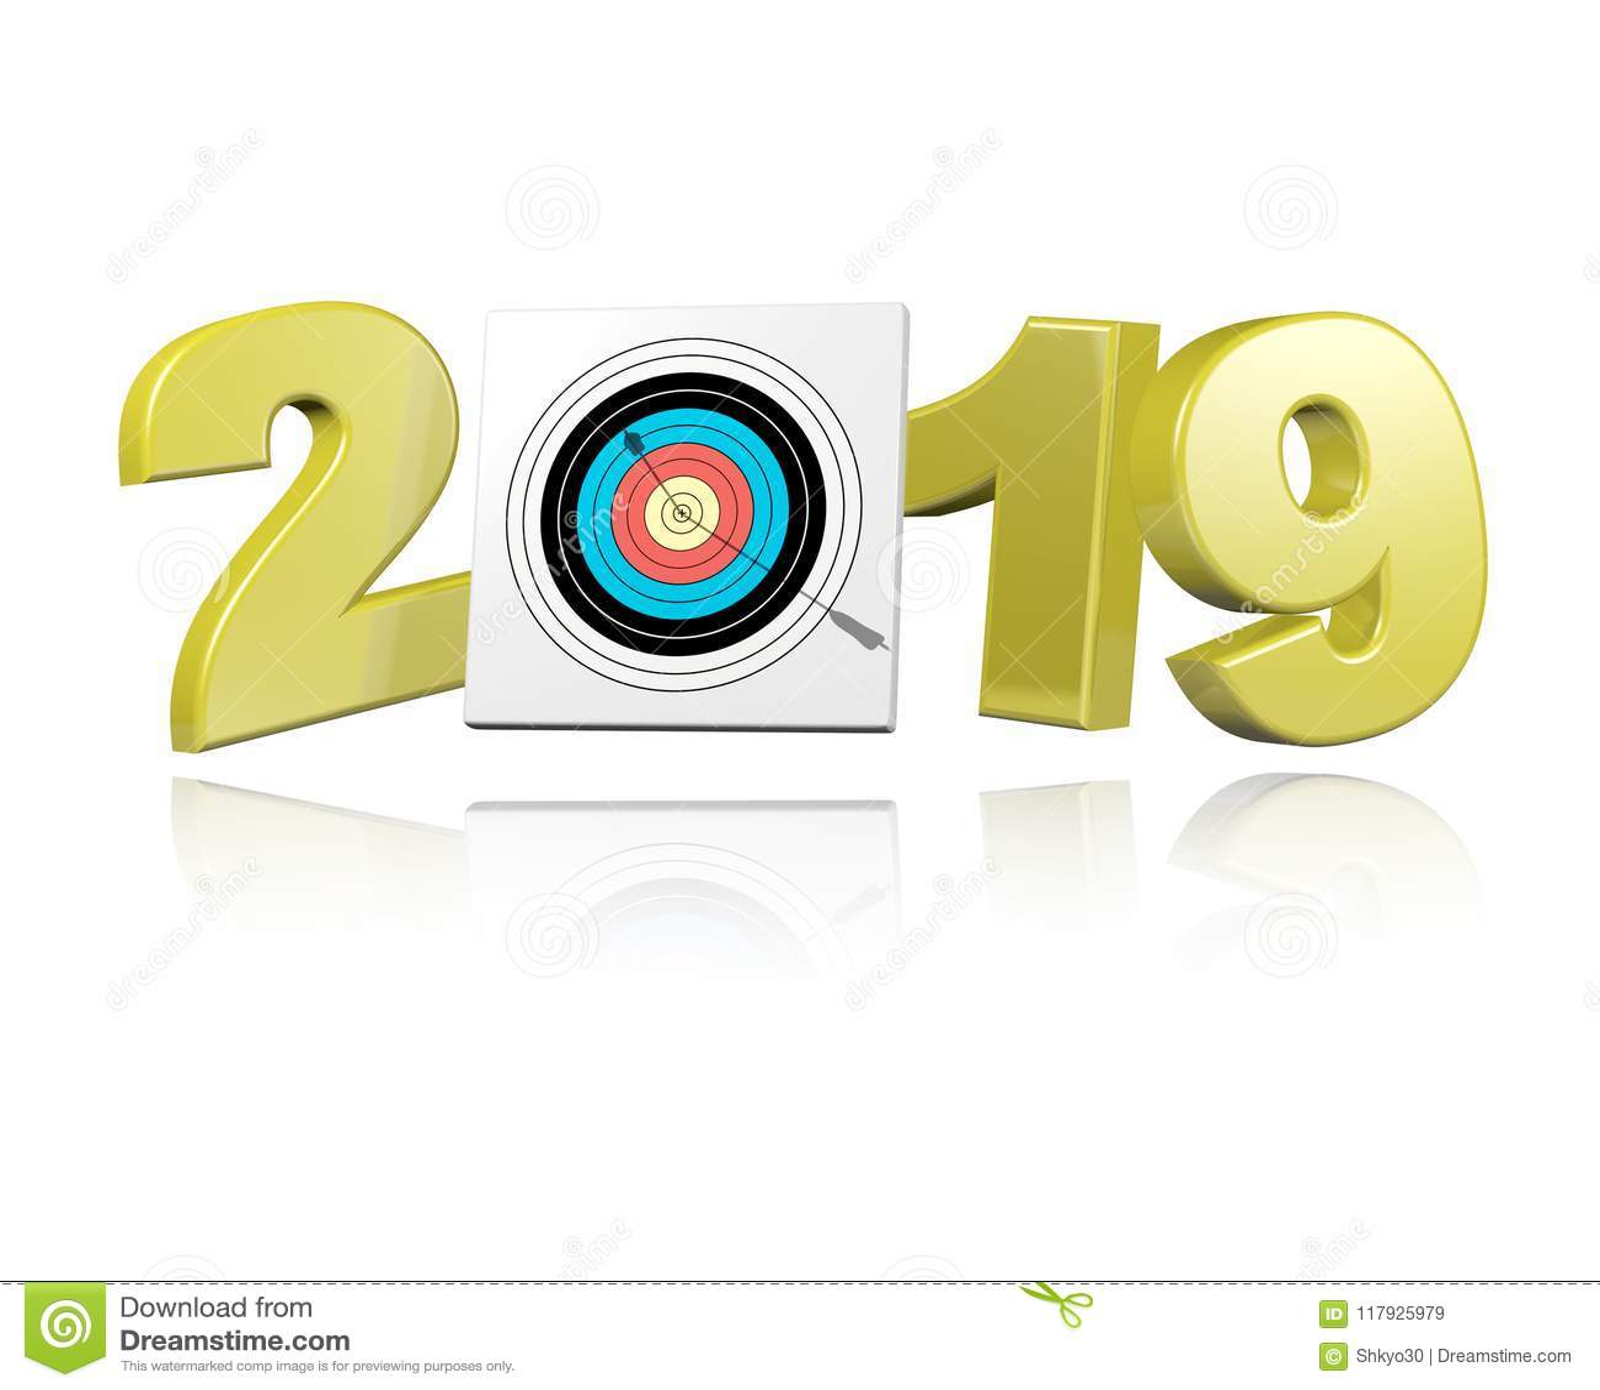 Archery Target With Arrow 2019 Design Stock Illustration